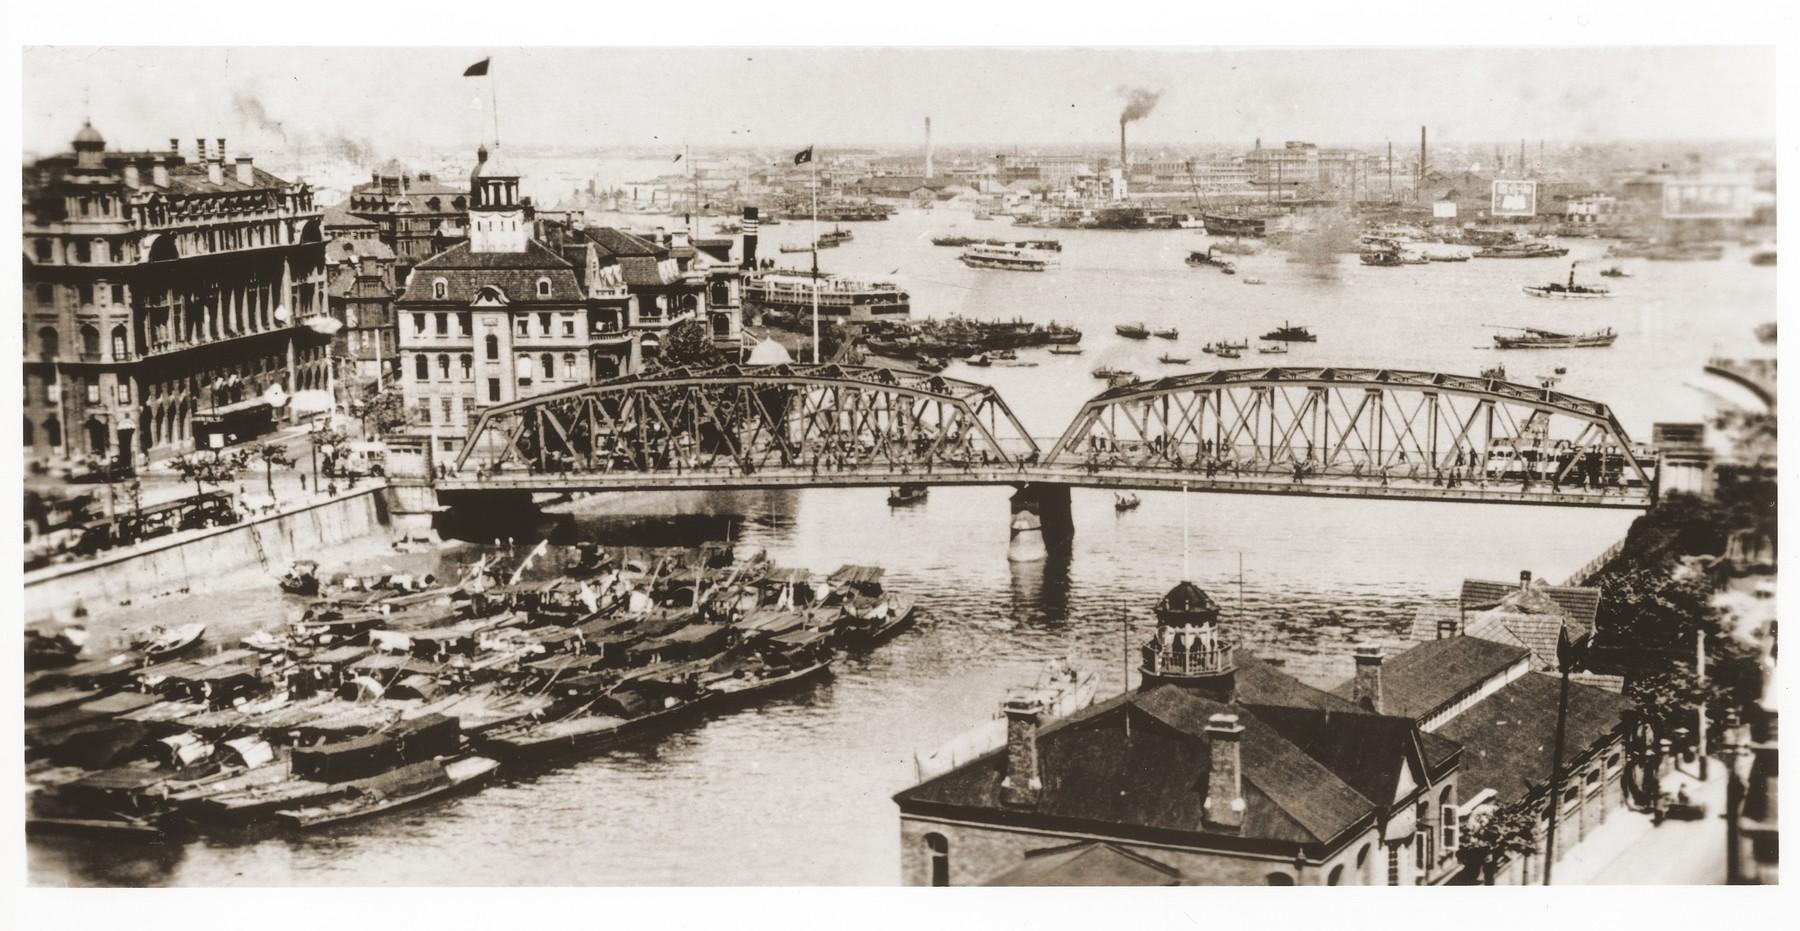 View of the Garden Bridge over the Yangtsepoo River in Shanghai.